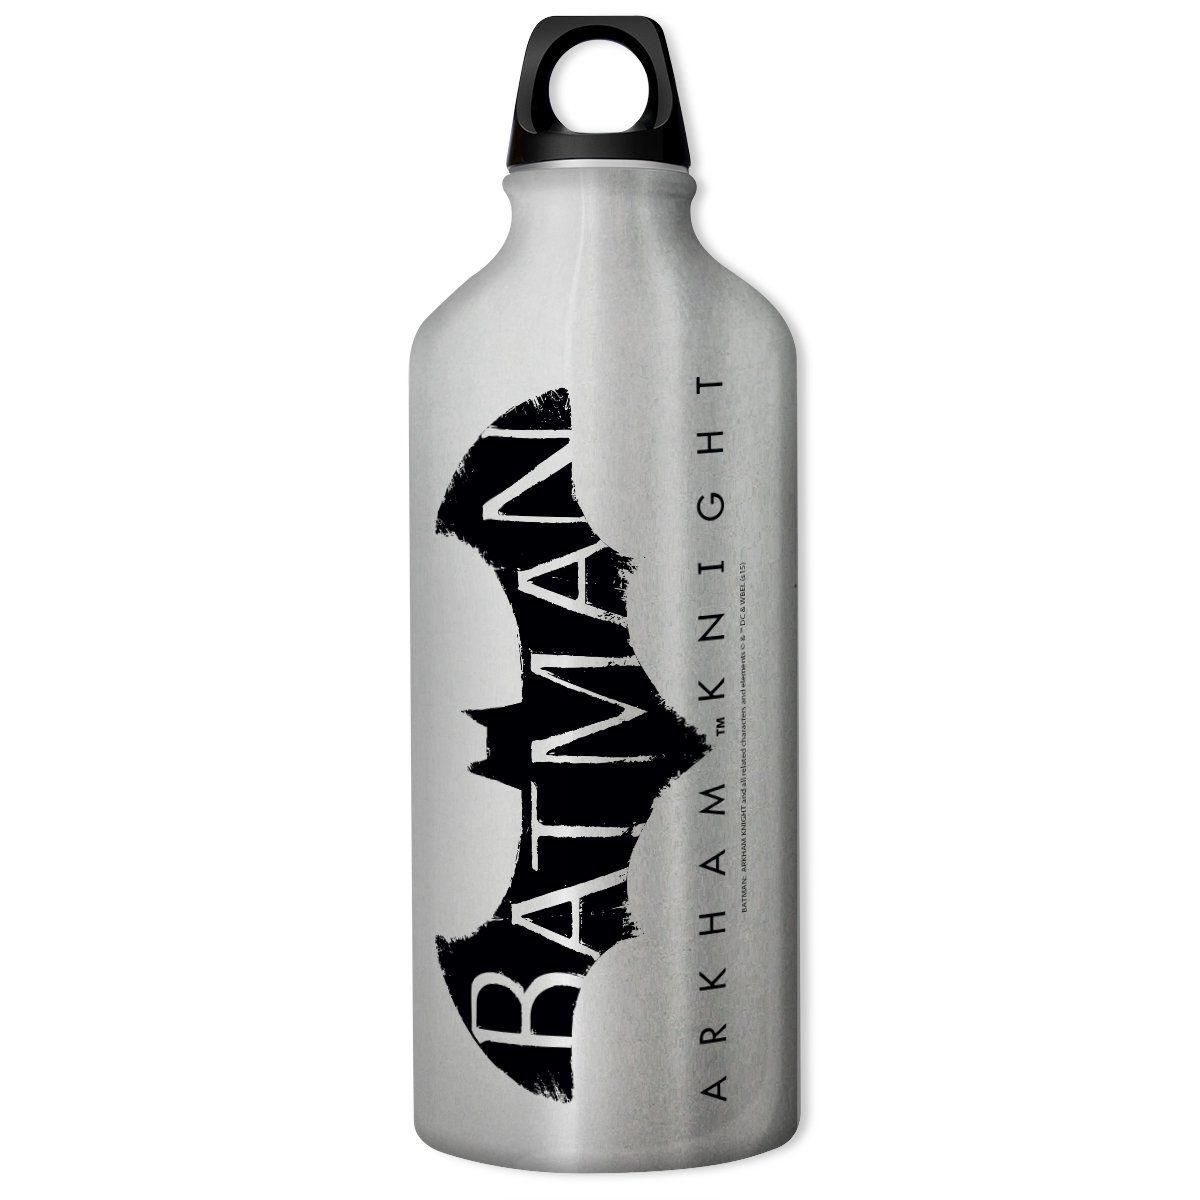 Squeeze Batman Arkham Knight Logo  - bandUP Store Marketplace